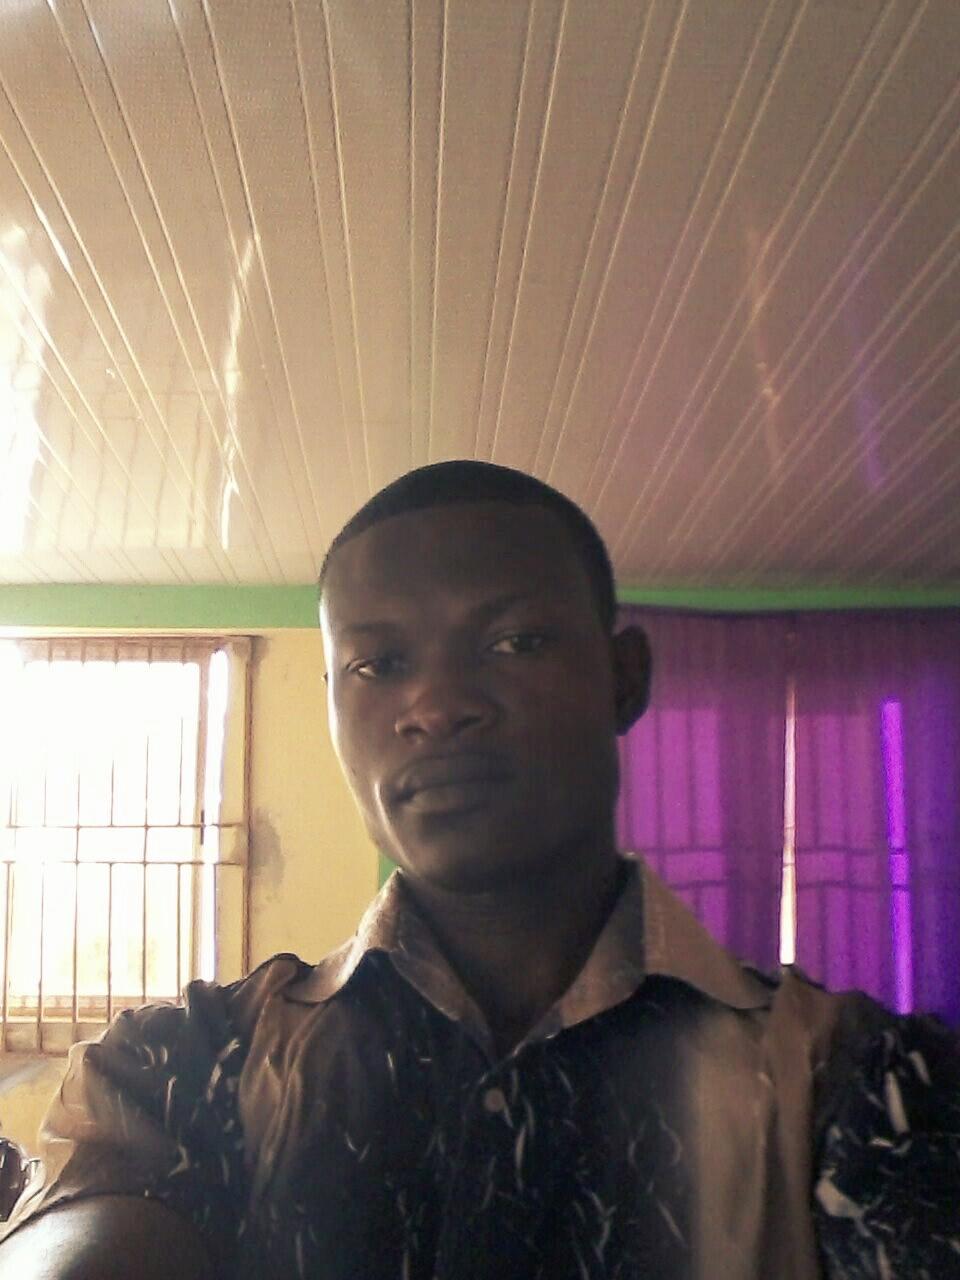 DOMINIC YEBOAH President of L4C Movement (Ghana, West Africa)